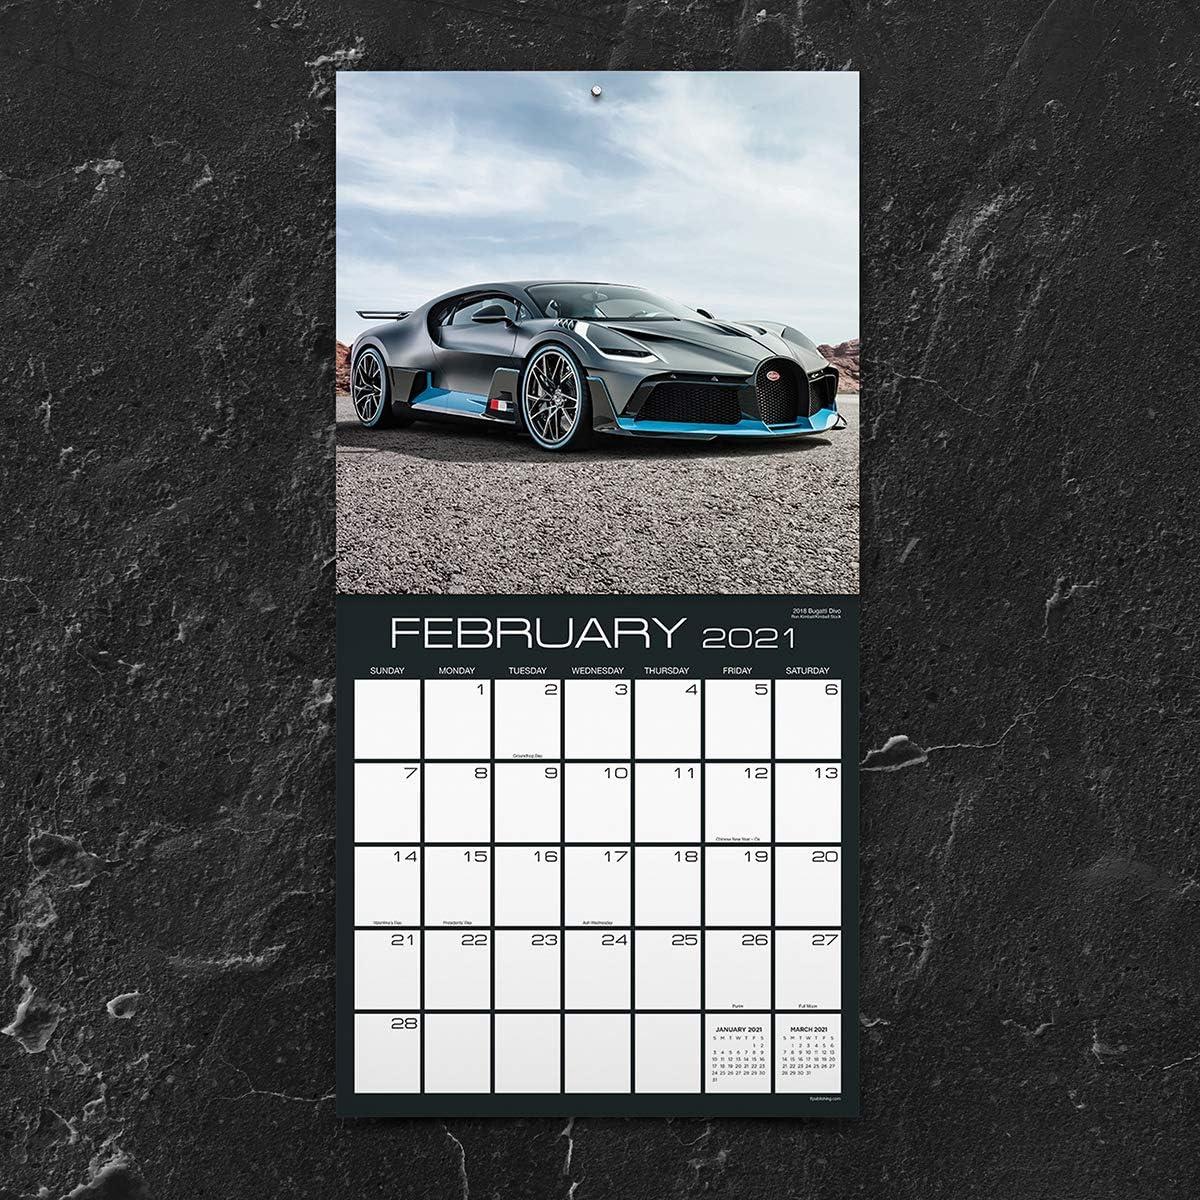 2021 Classic Cars 12x12 Wall Calendar